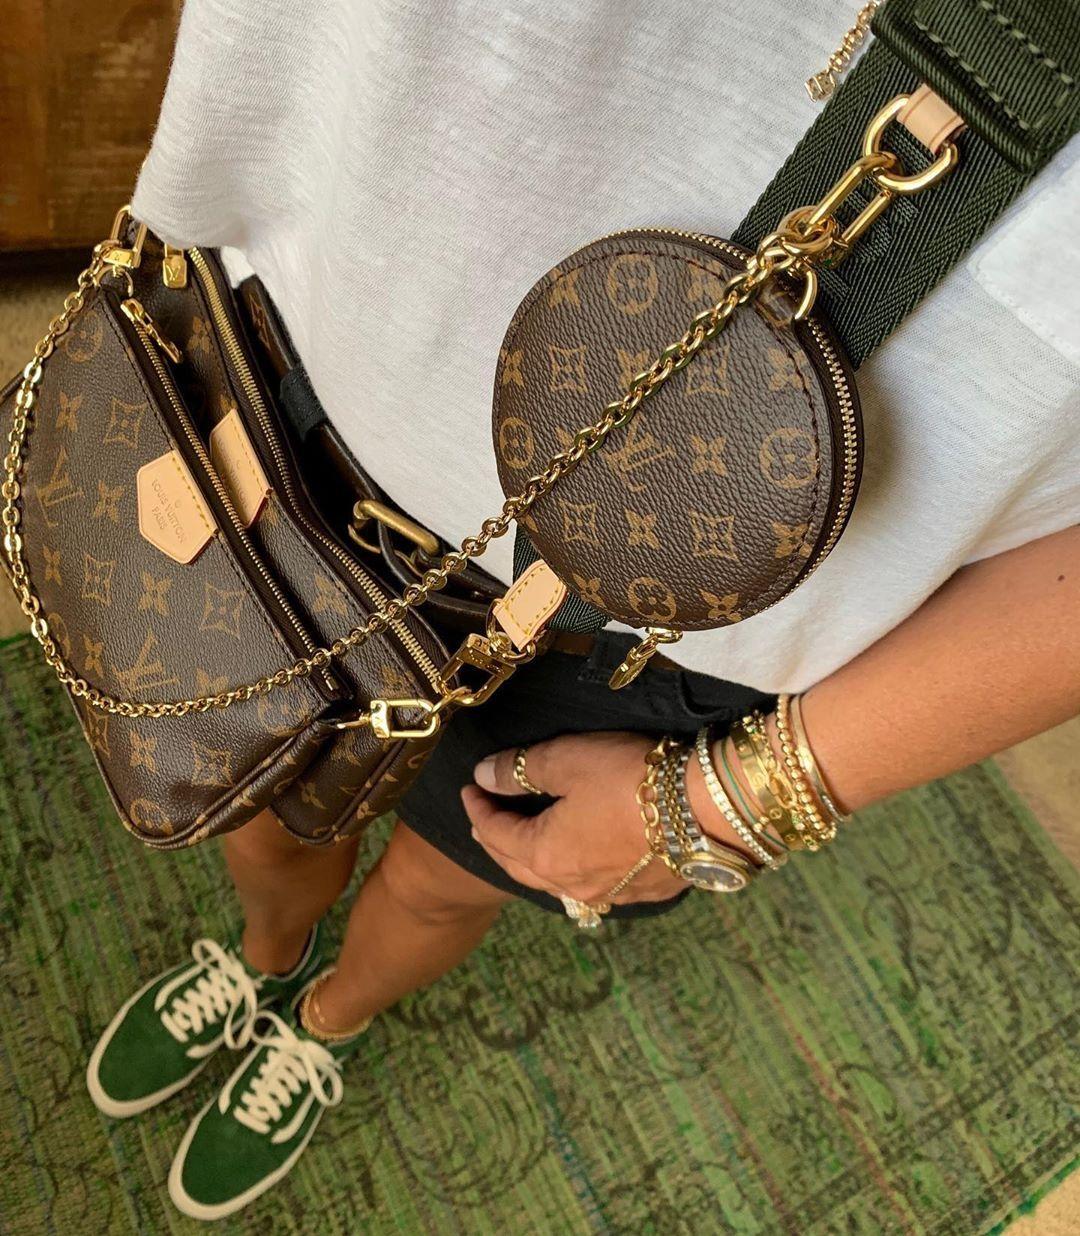 Pin By Gloria Escobedo On Papyros Io Latest Bags Louis Vuitton Shoes Heels Louis Vuitton Shoes Louis Vuitton Handbags